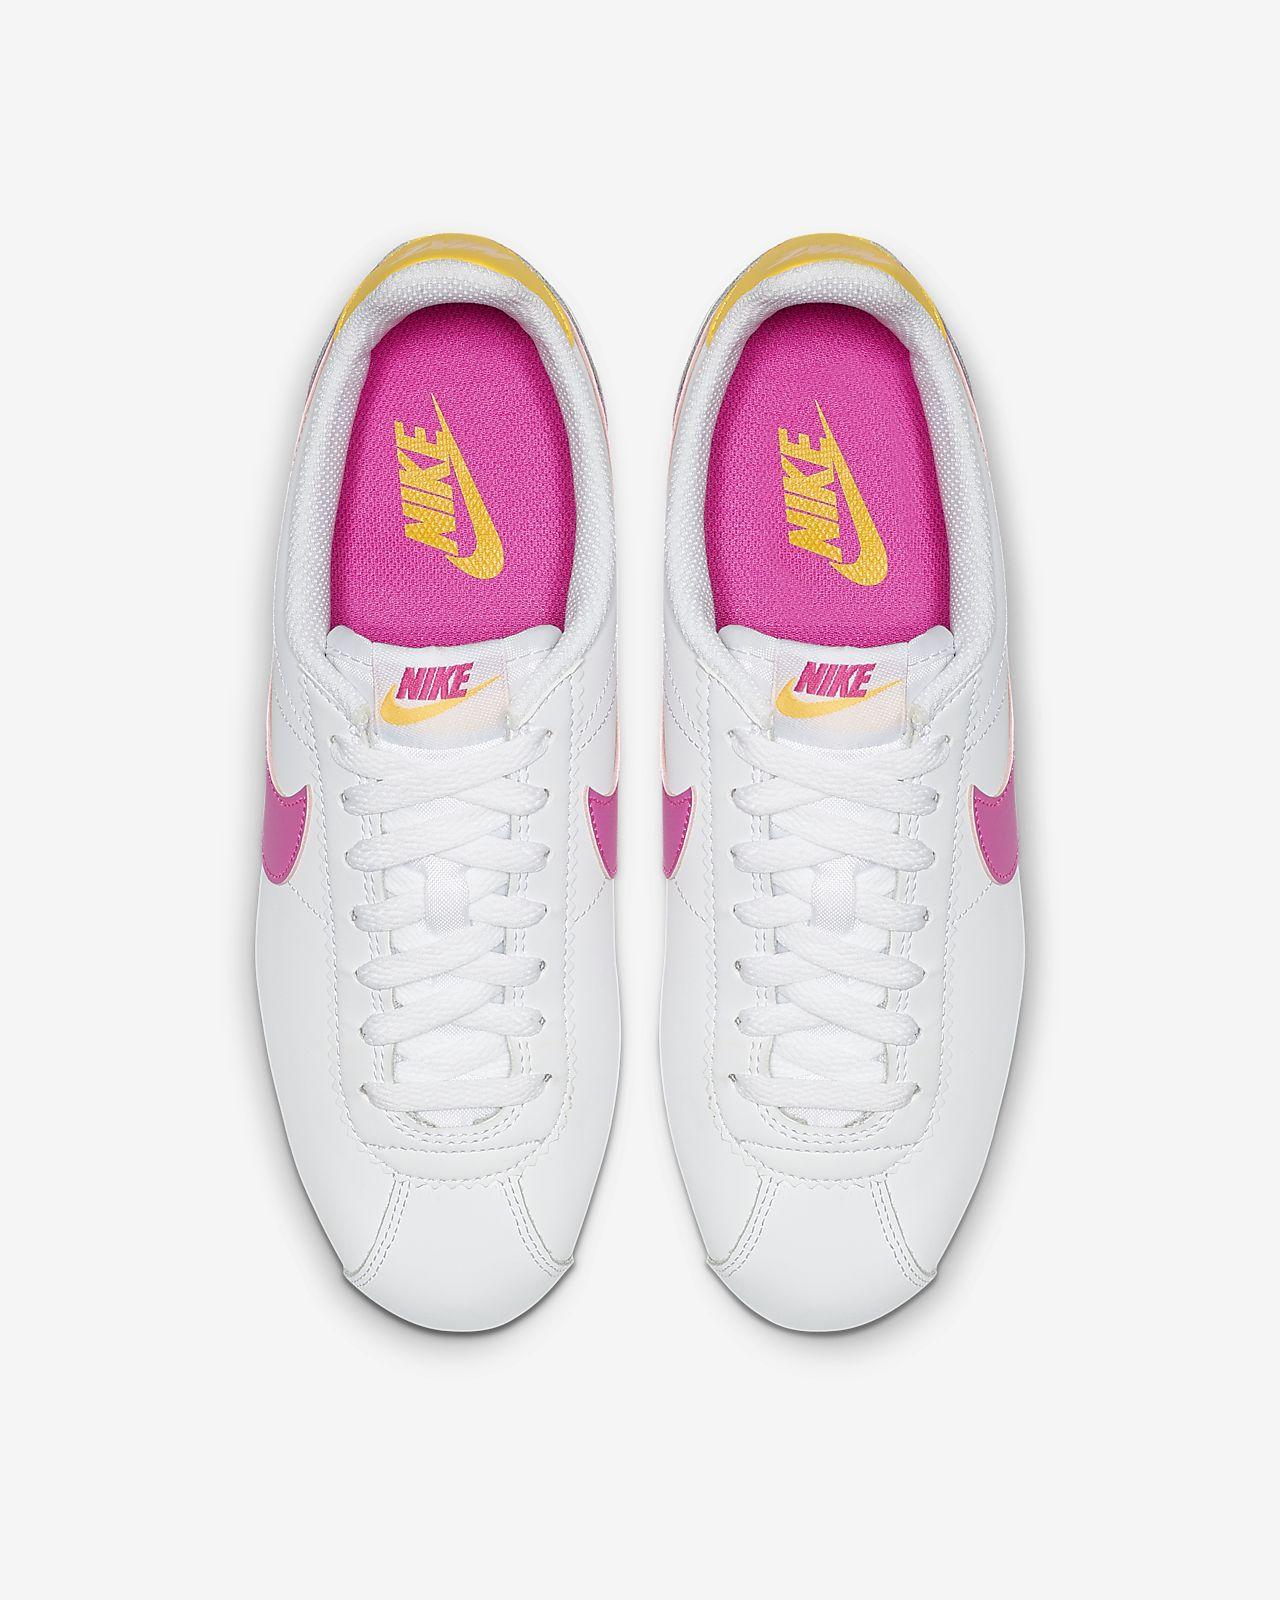 a9d0f7661d8f Nike Classic Cortez Damenschuh